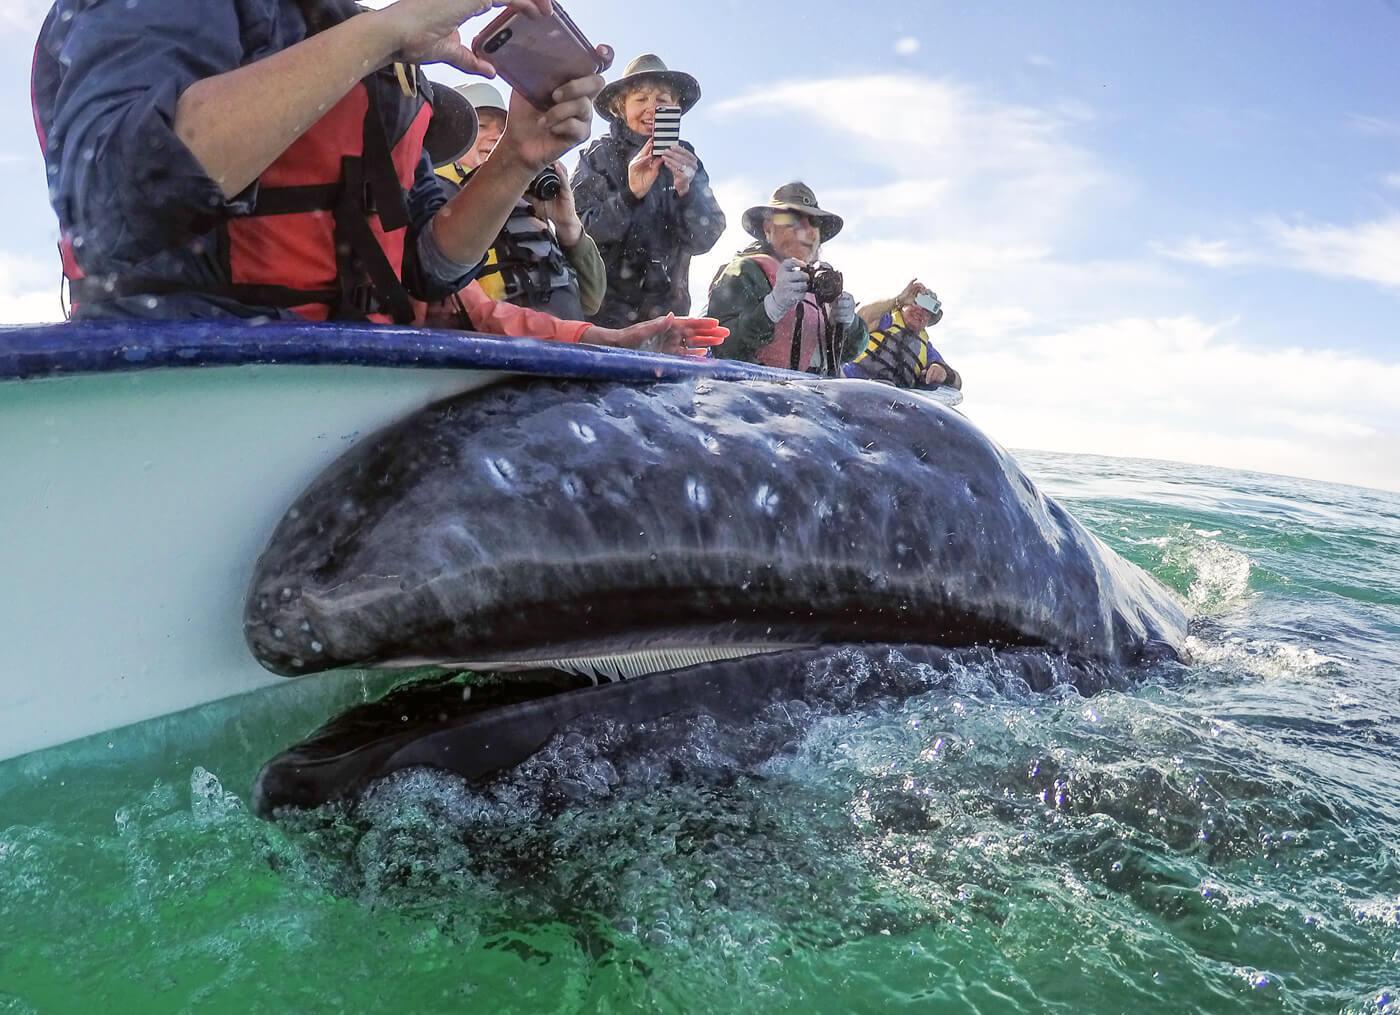 A friendly gray whale calf shows its baleen plates. © Jose Sanchez